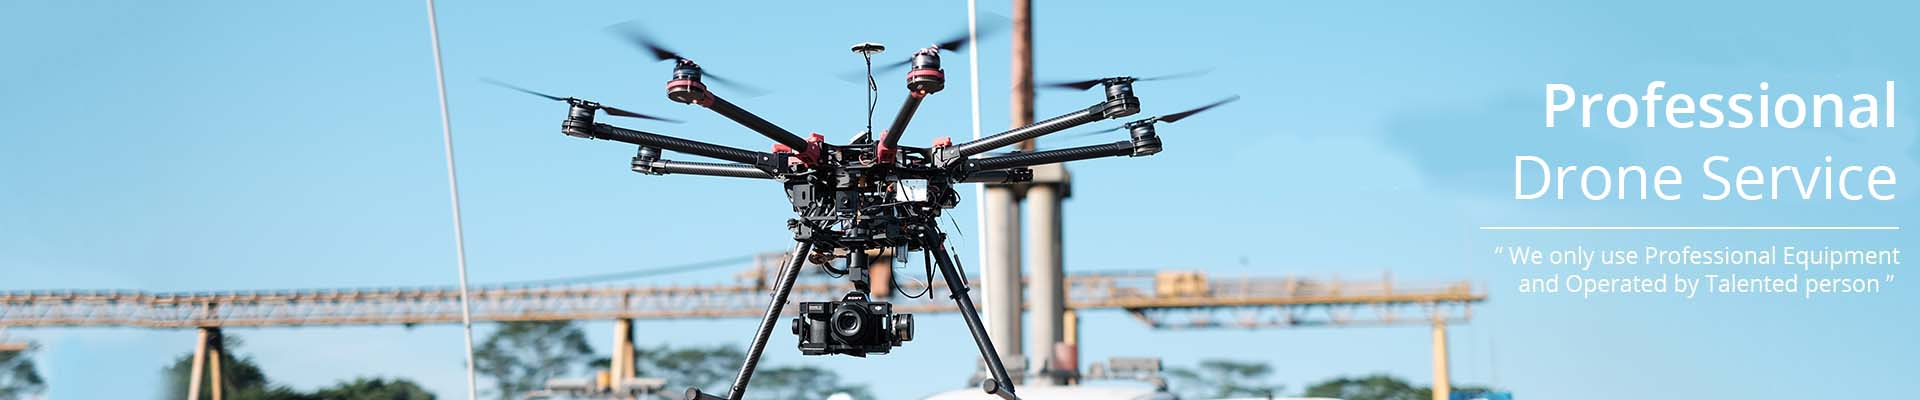 harga sewa drone